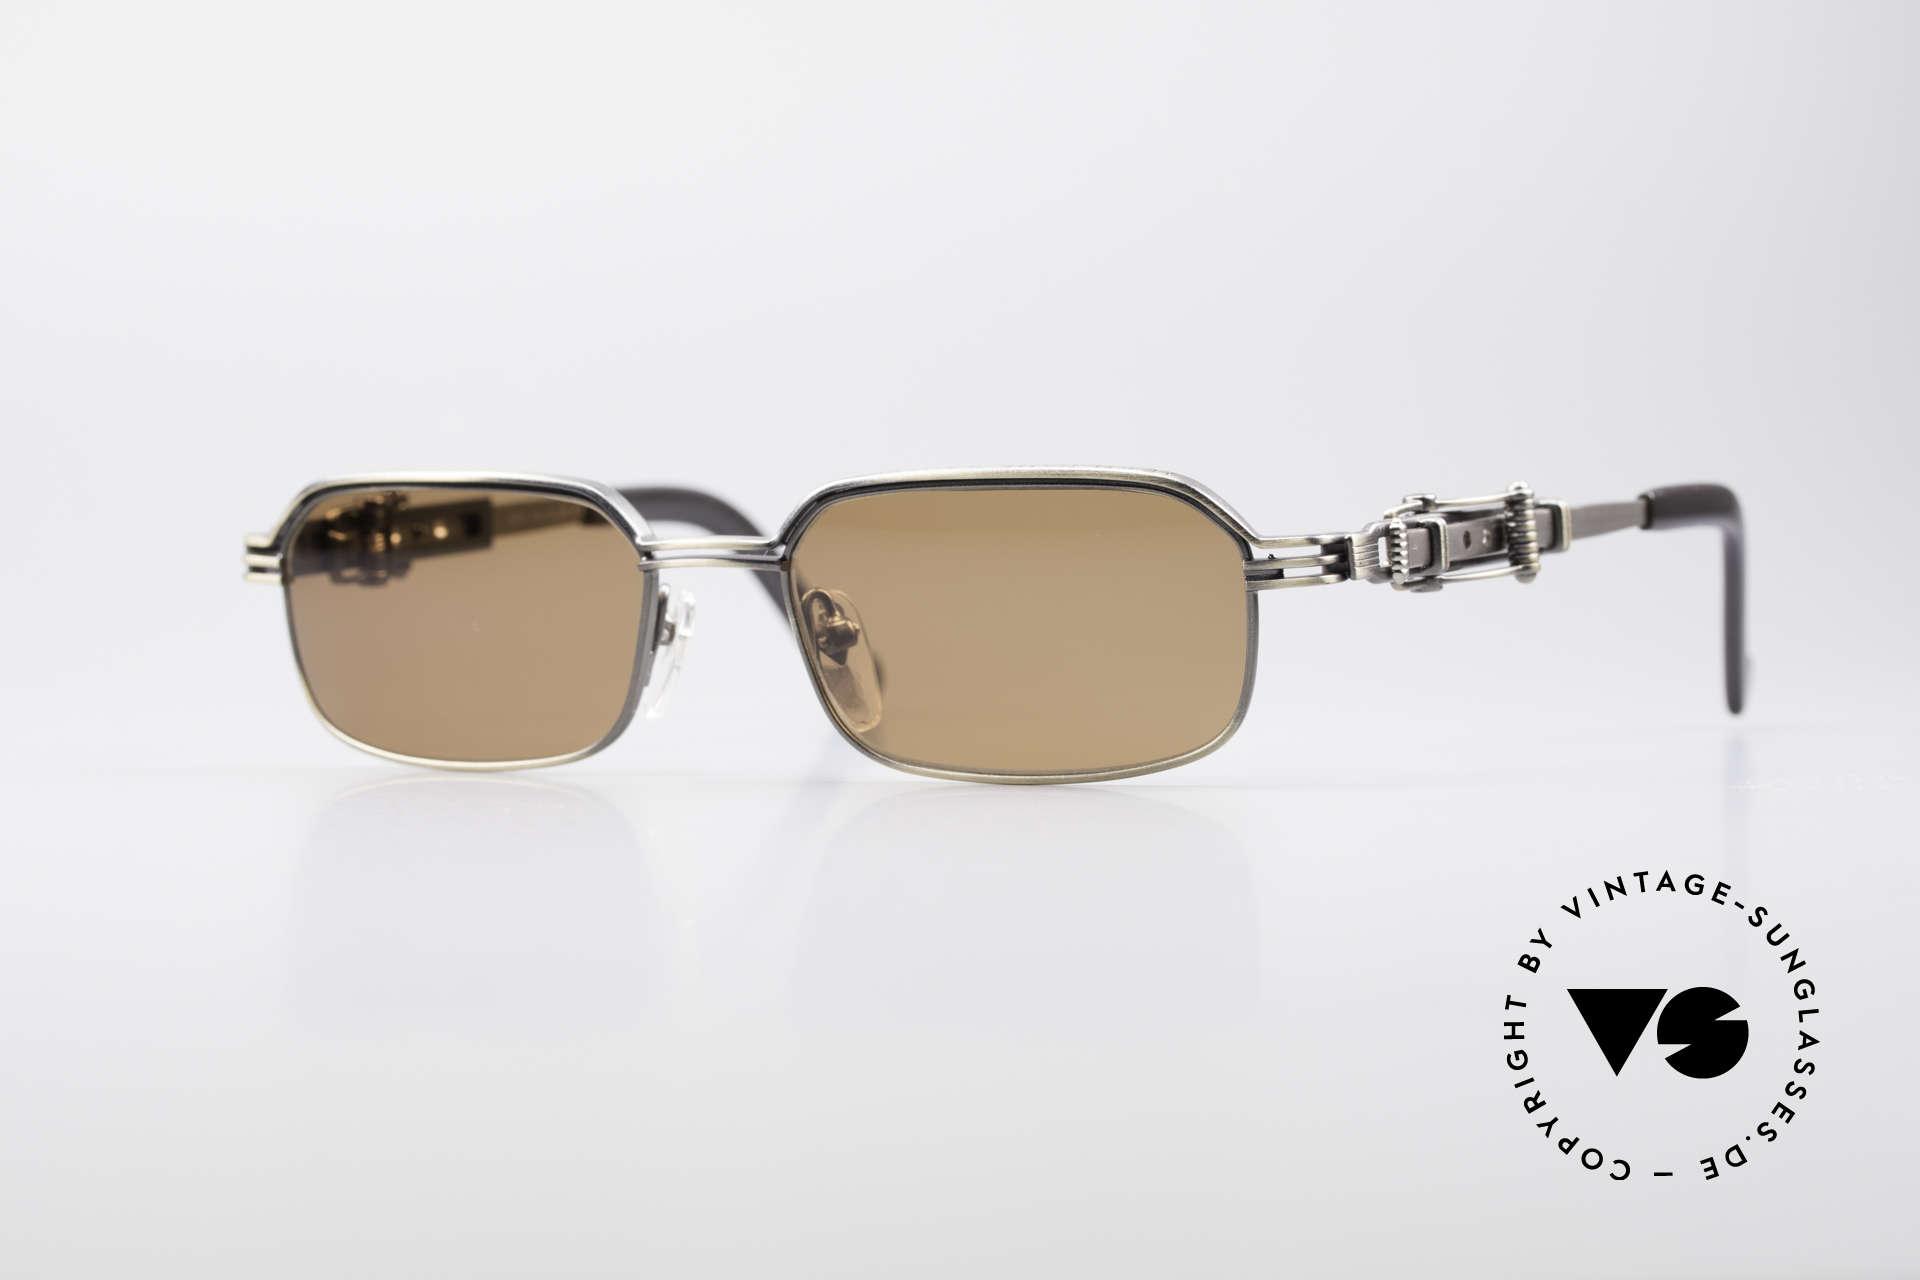 Jean Paul Gaultier 56-0002 Adjustable Frame Belt Buckle, vintage Jean Paul GAULTIER sunglasses from 1996, Made for Men